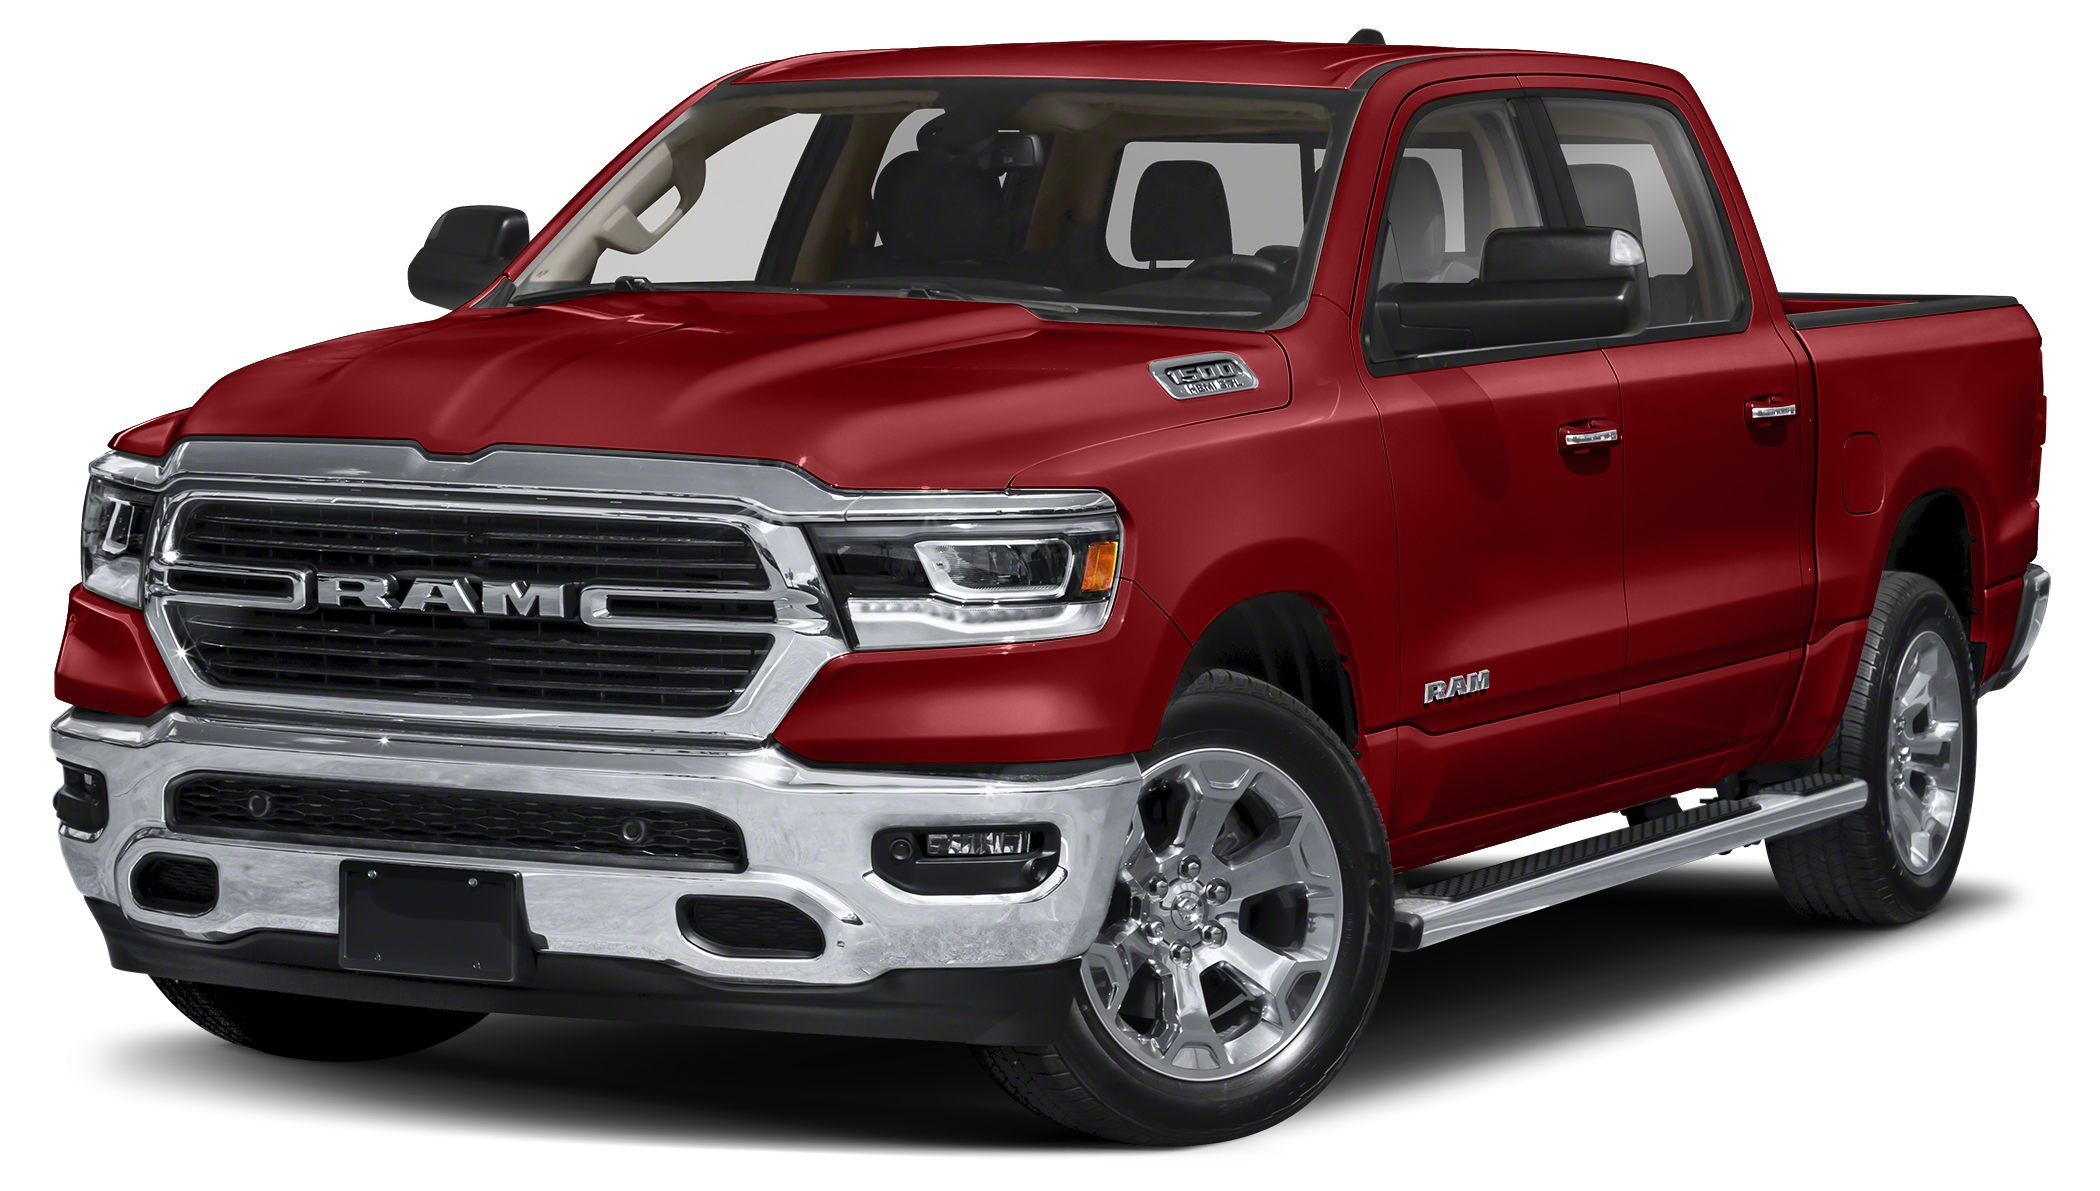 2019 RAM 1500 Laramie This 2019 Ram 1500 4dr Laramie 4x2 Crew Cab 57 Box features a 57L V8 HEMI